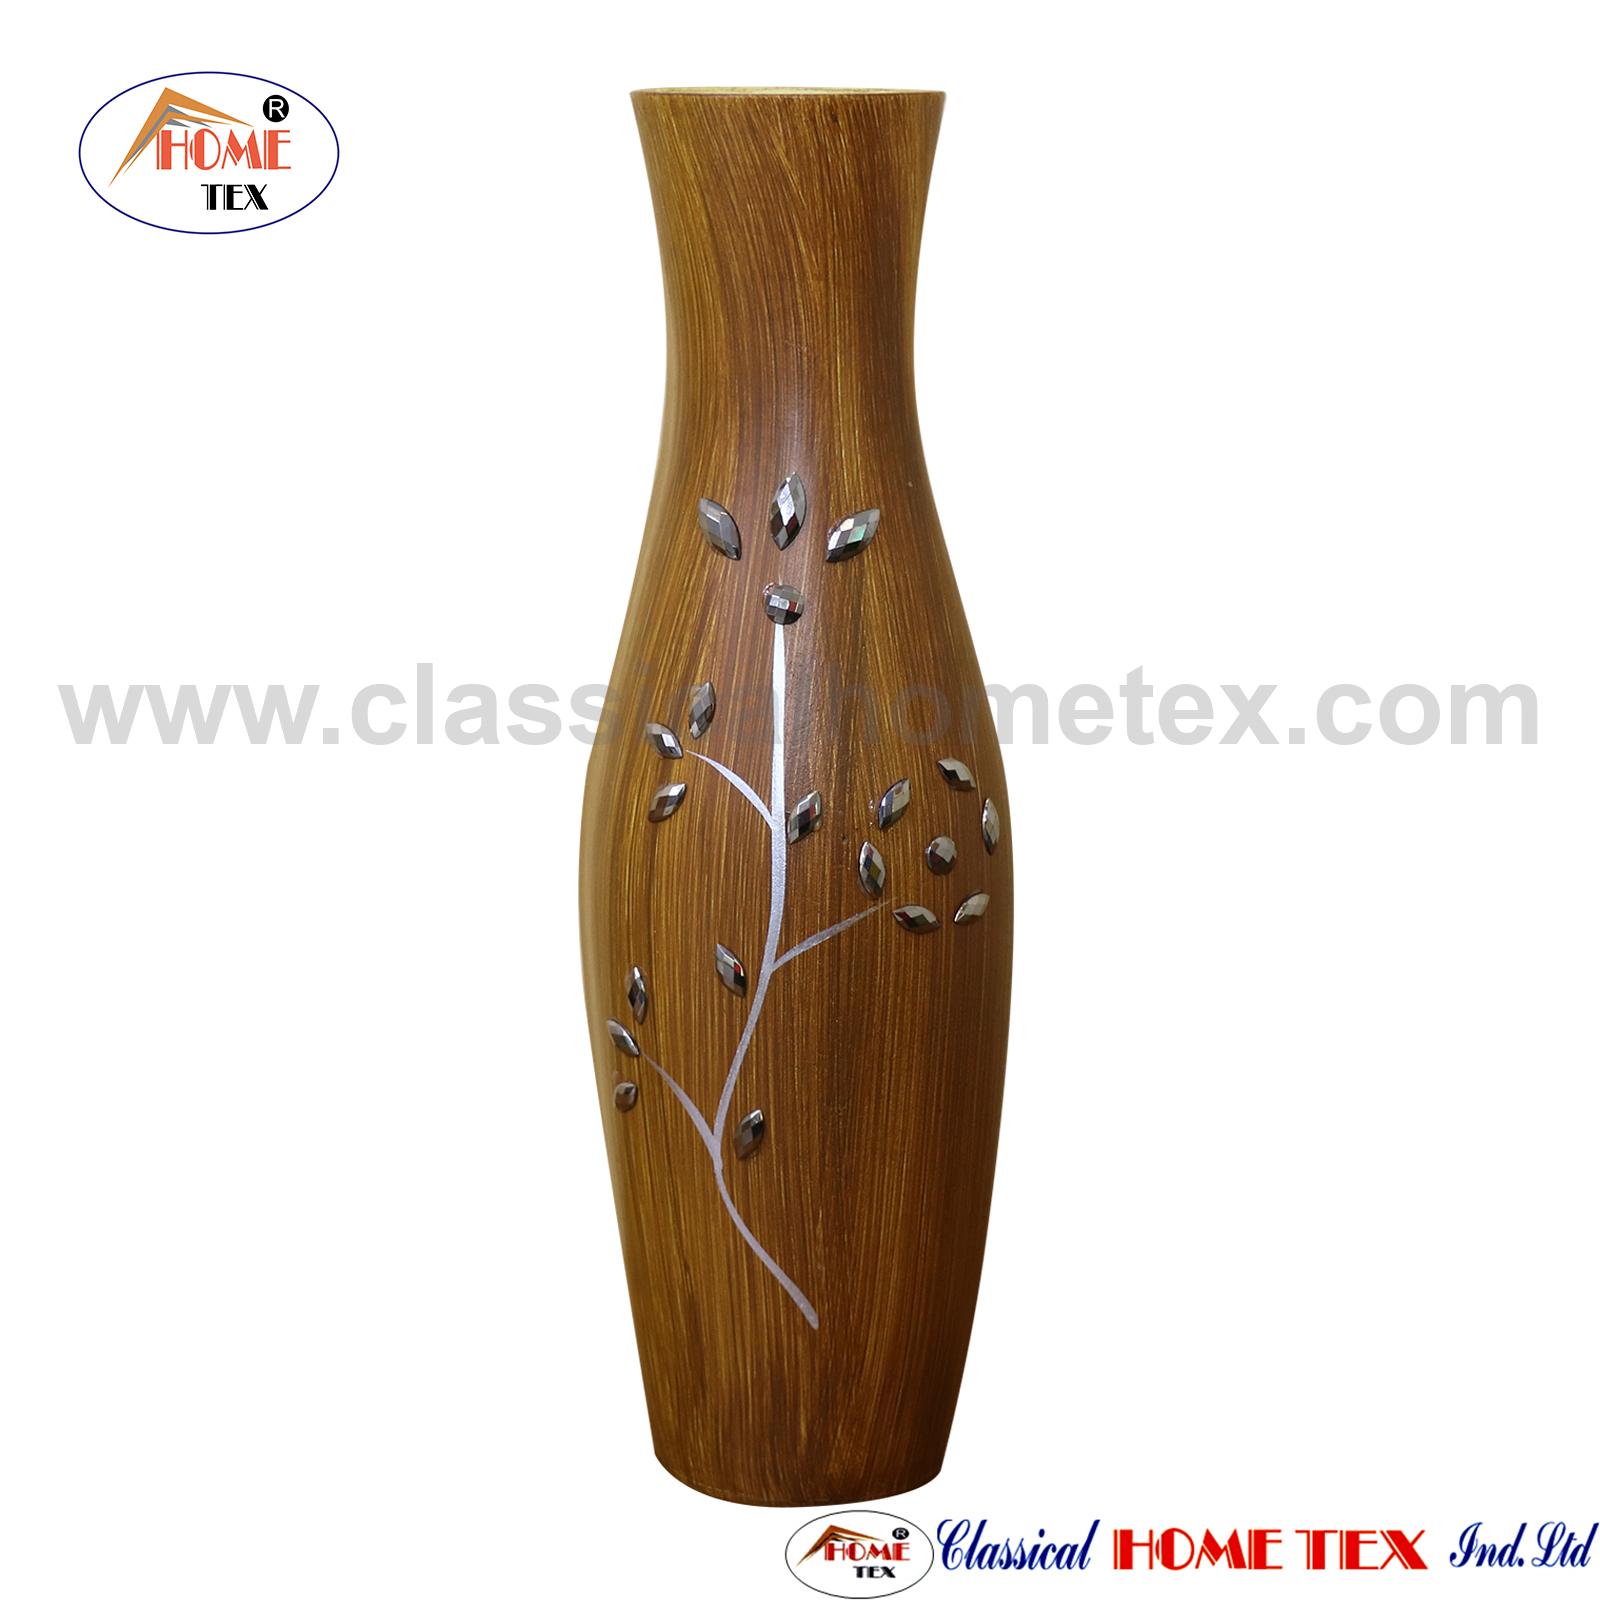 Wooden Flower Vase - Brown Color 2974-101  sc 1 st  Classical Hometex & Buy Flower Vase in bd from HomeTex